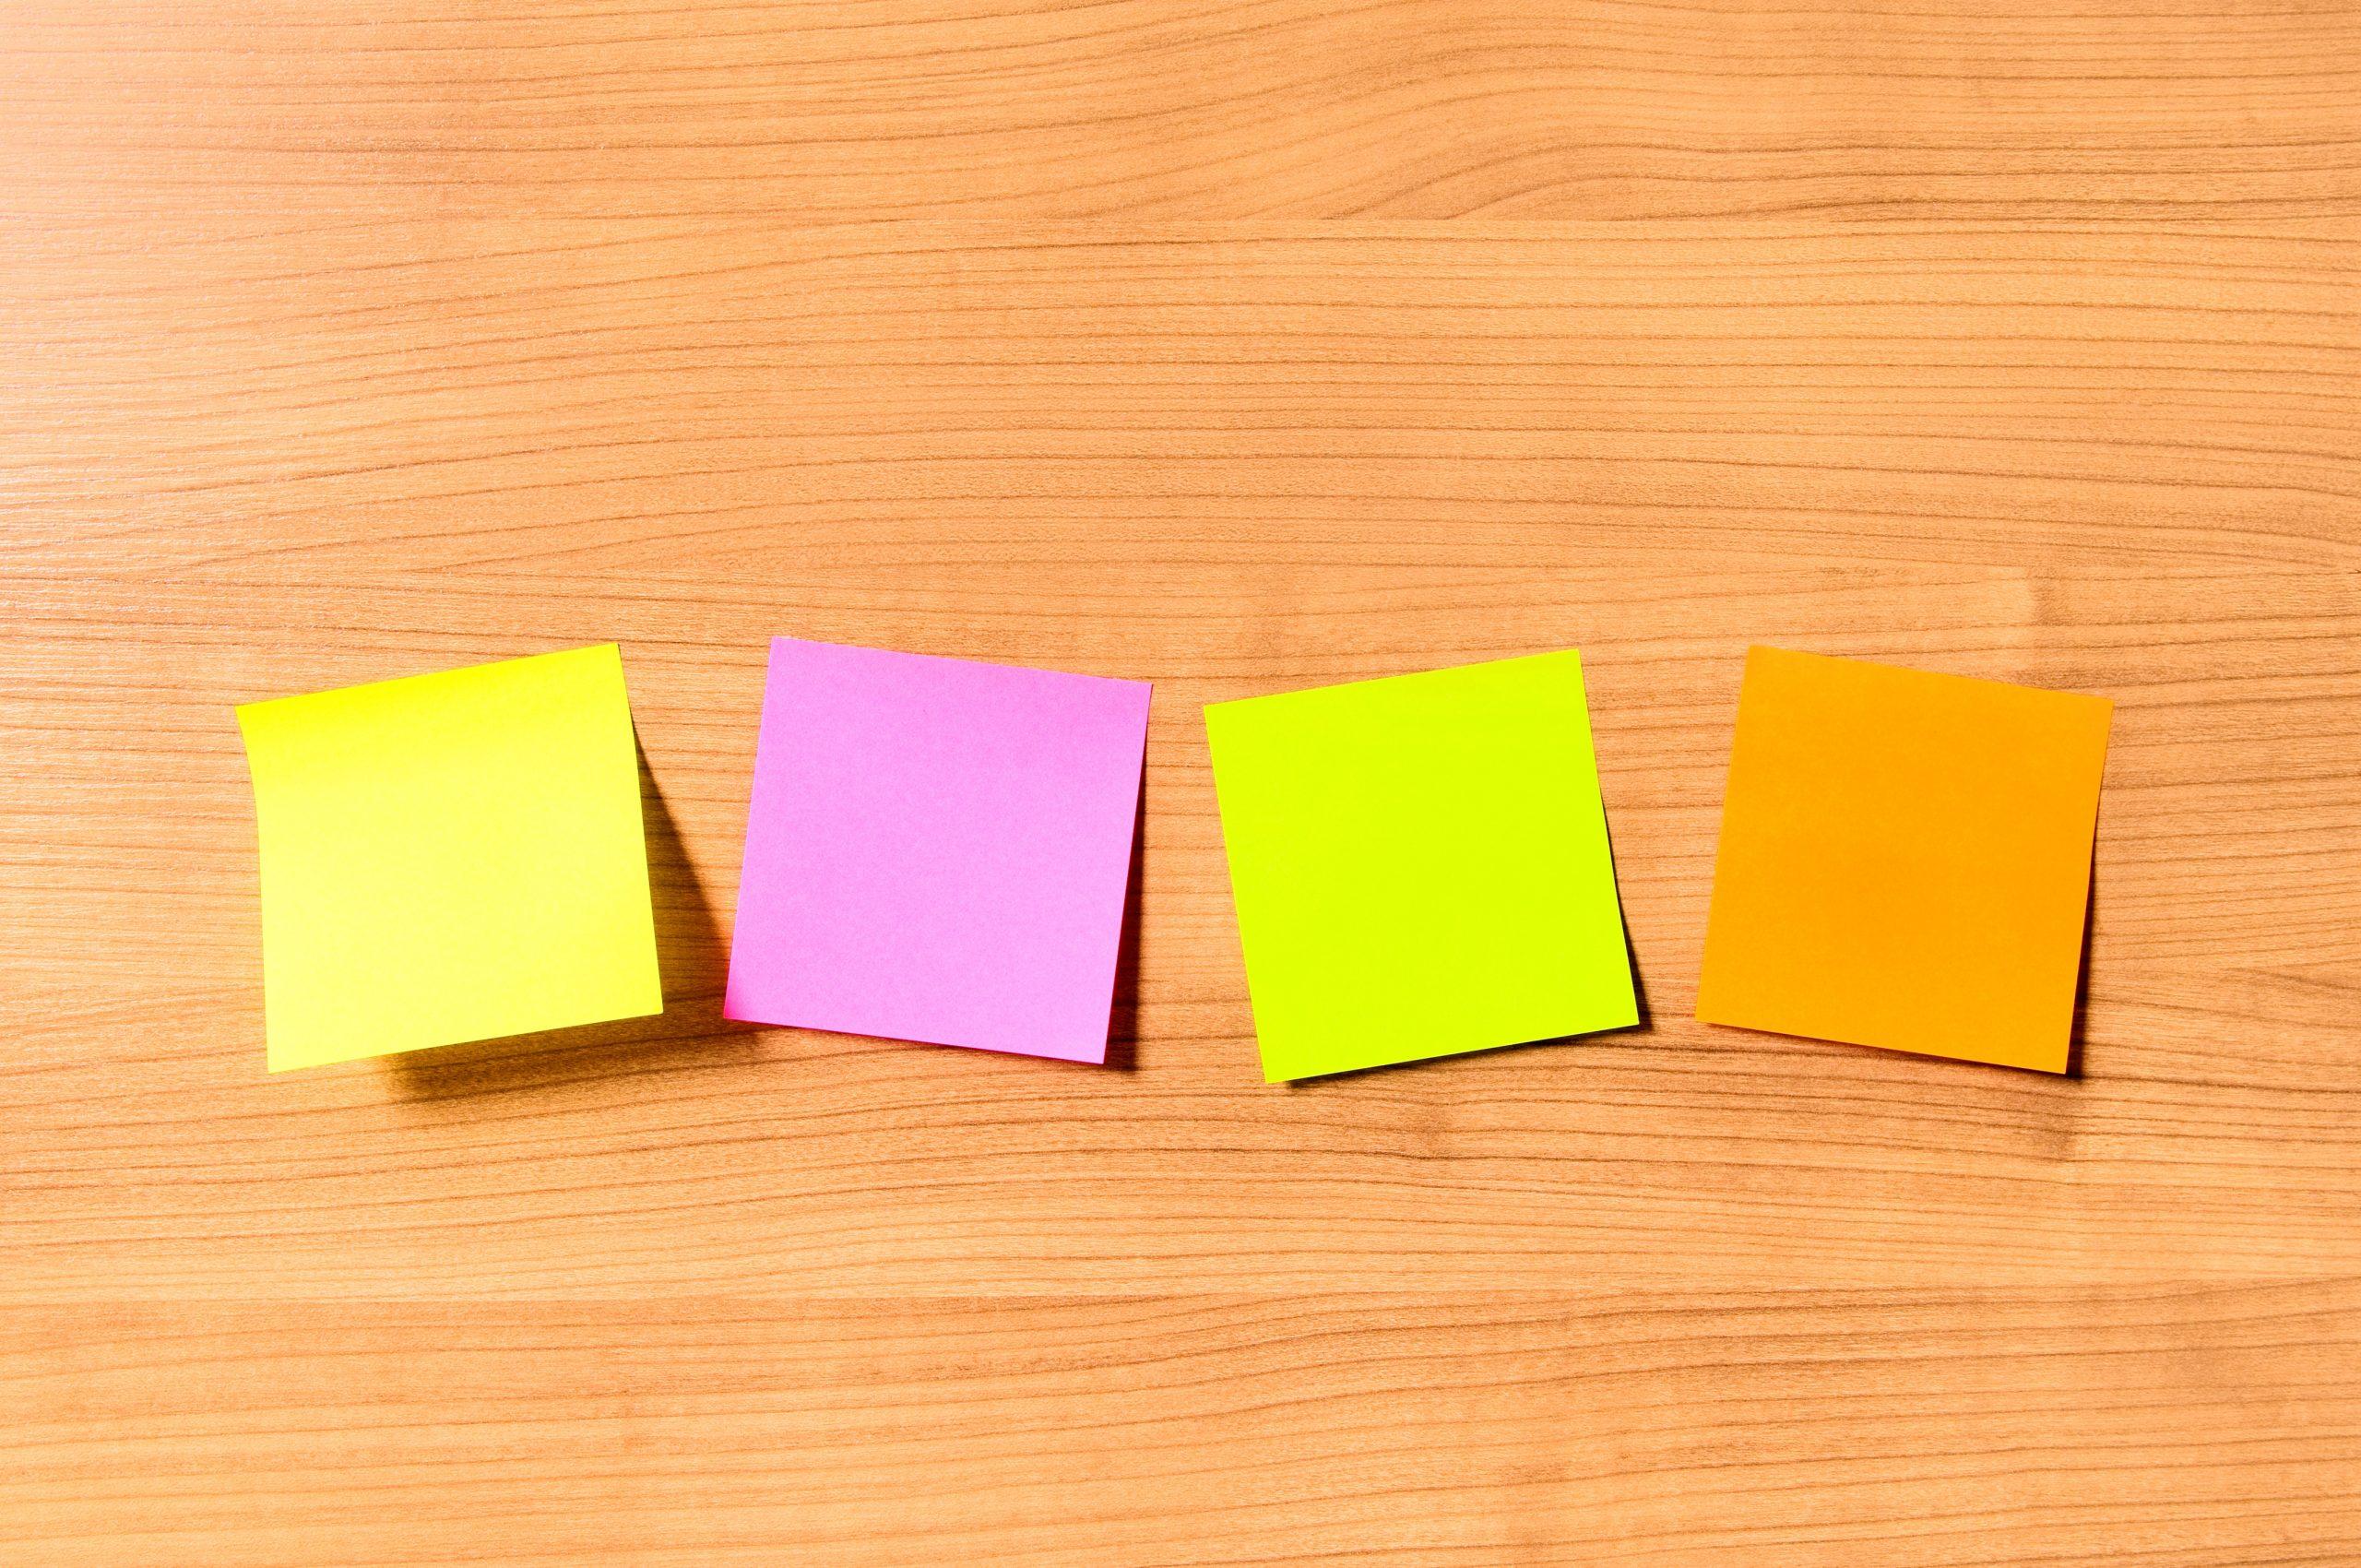 sticky notes on desk, declutter, organize